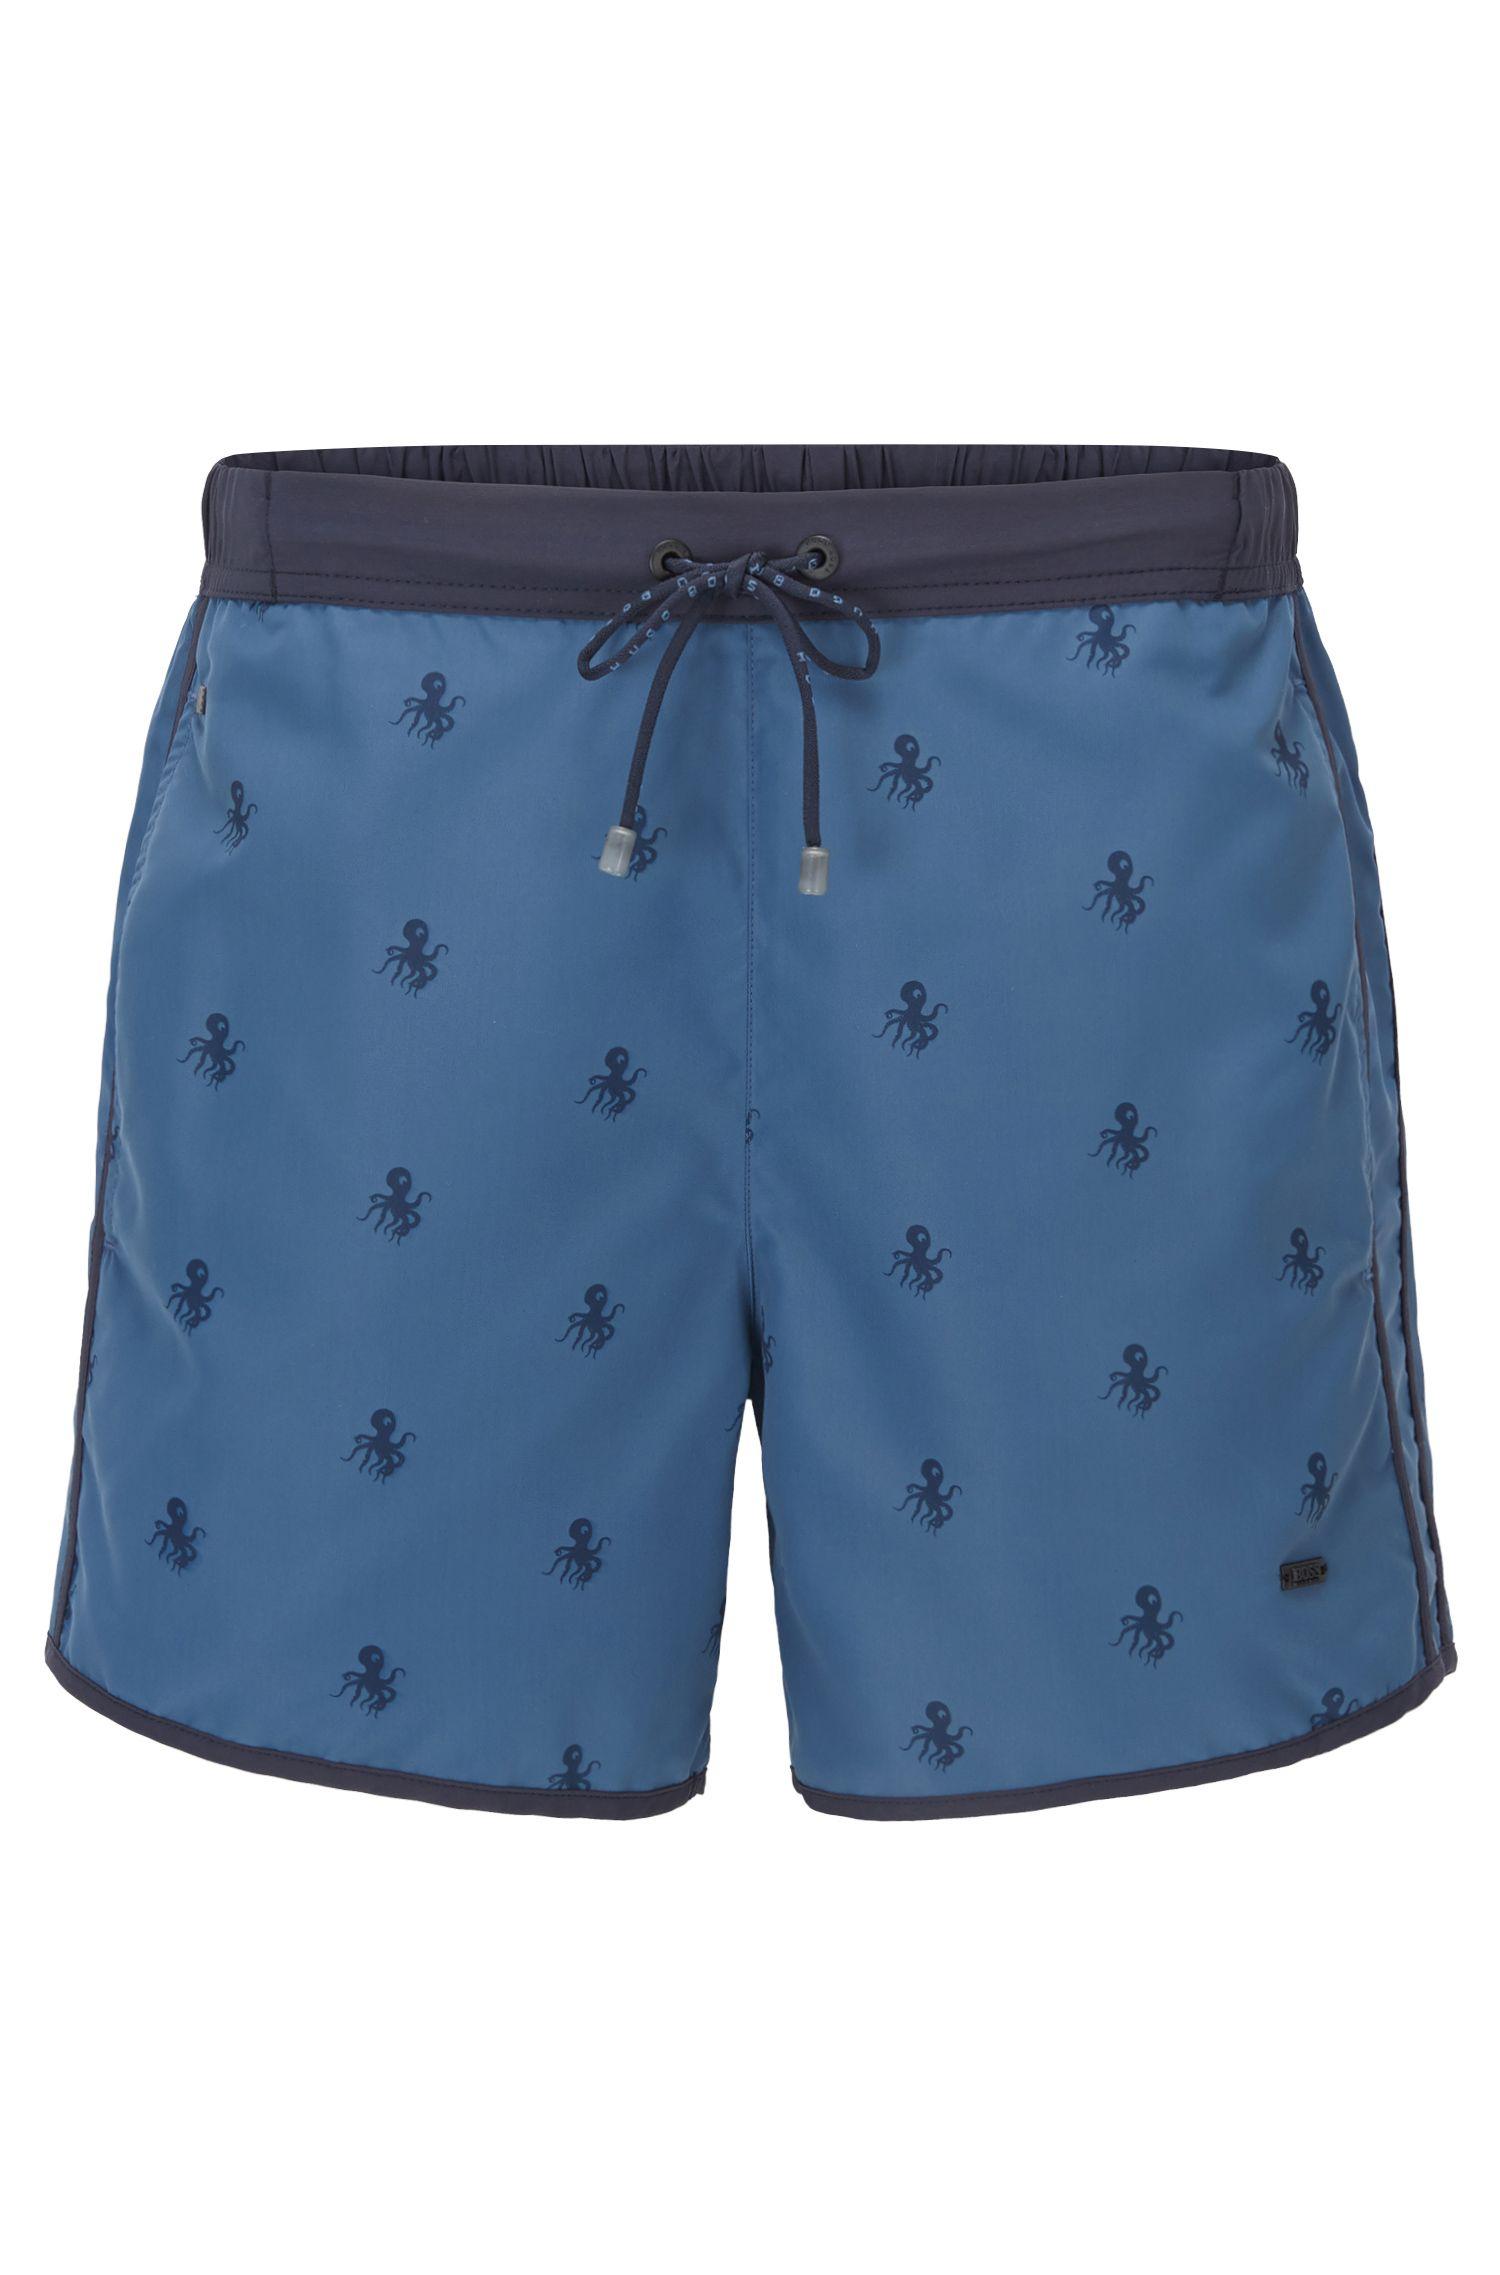 Quick Dry Nylon Embroidered Swim Shorts | White Shark